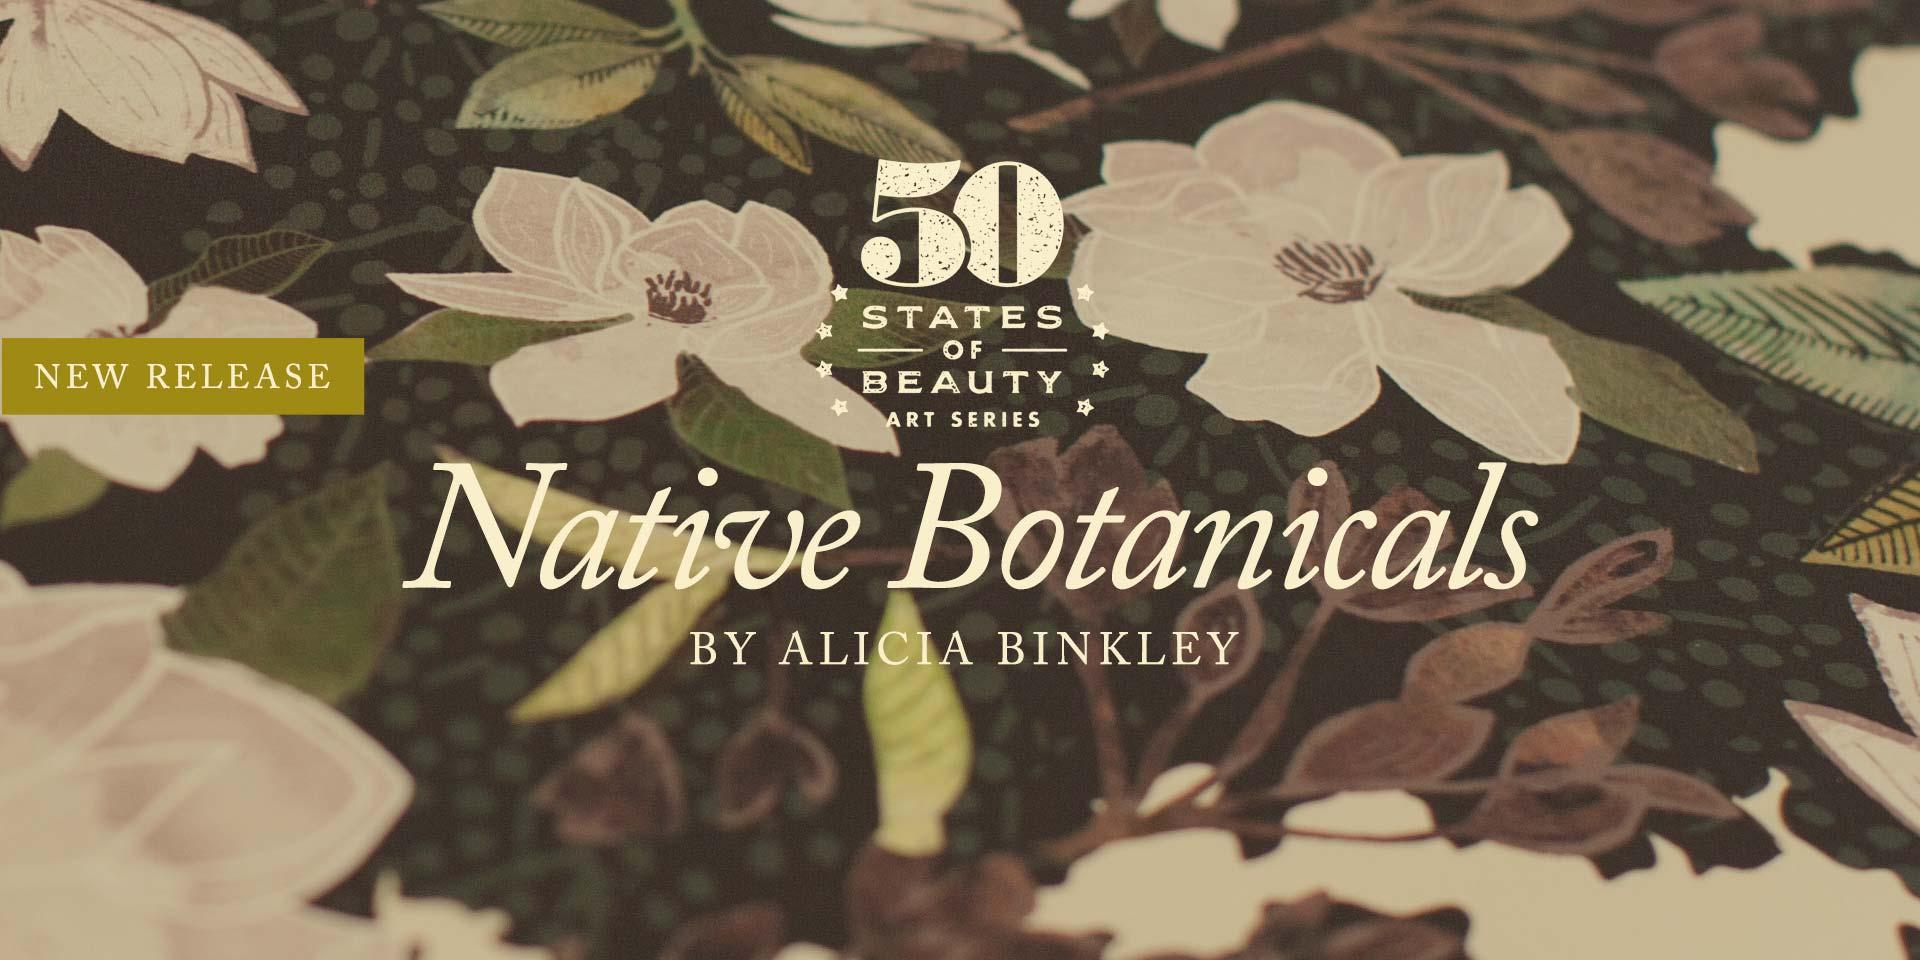 Native-Botanicals-slideshow-louisiana-1920x960.jpg